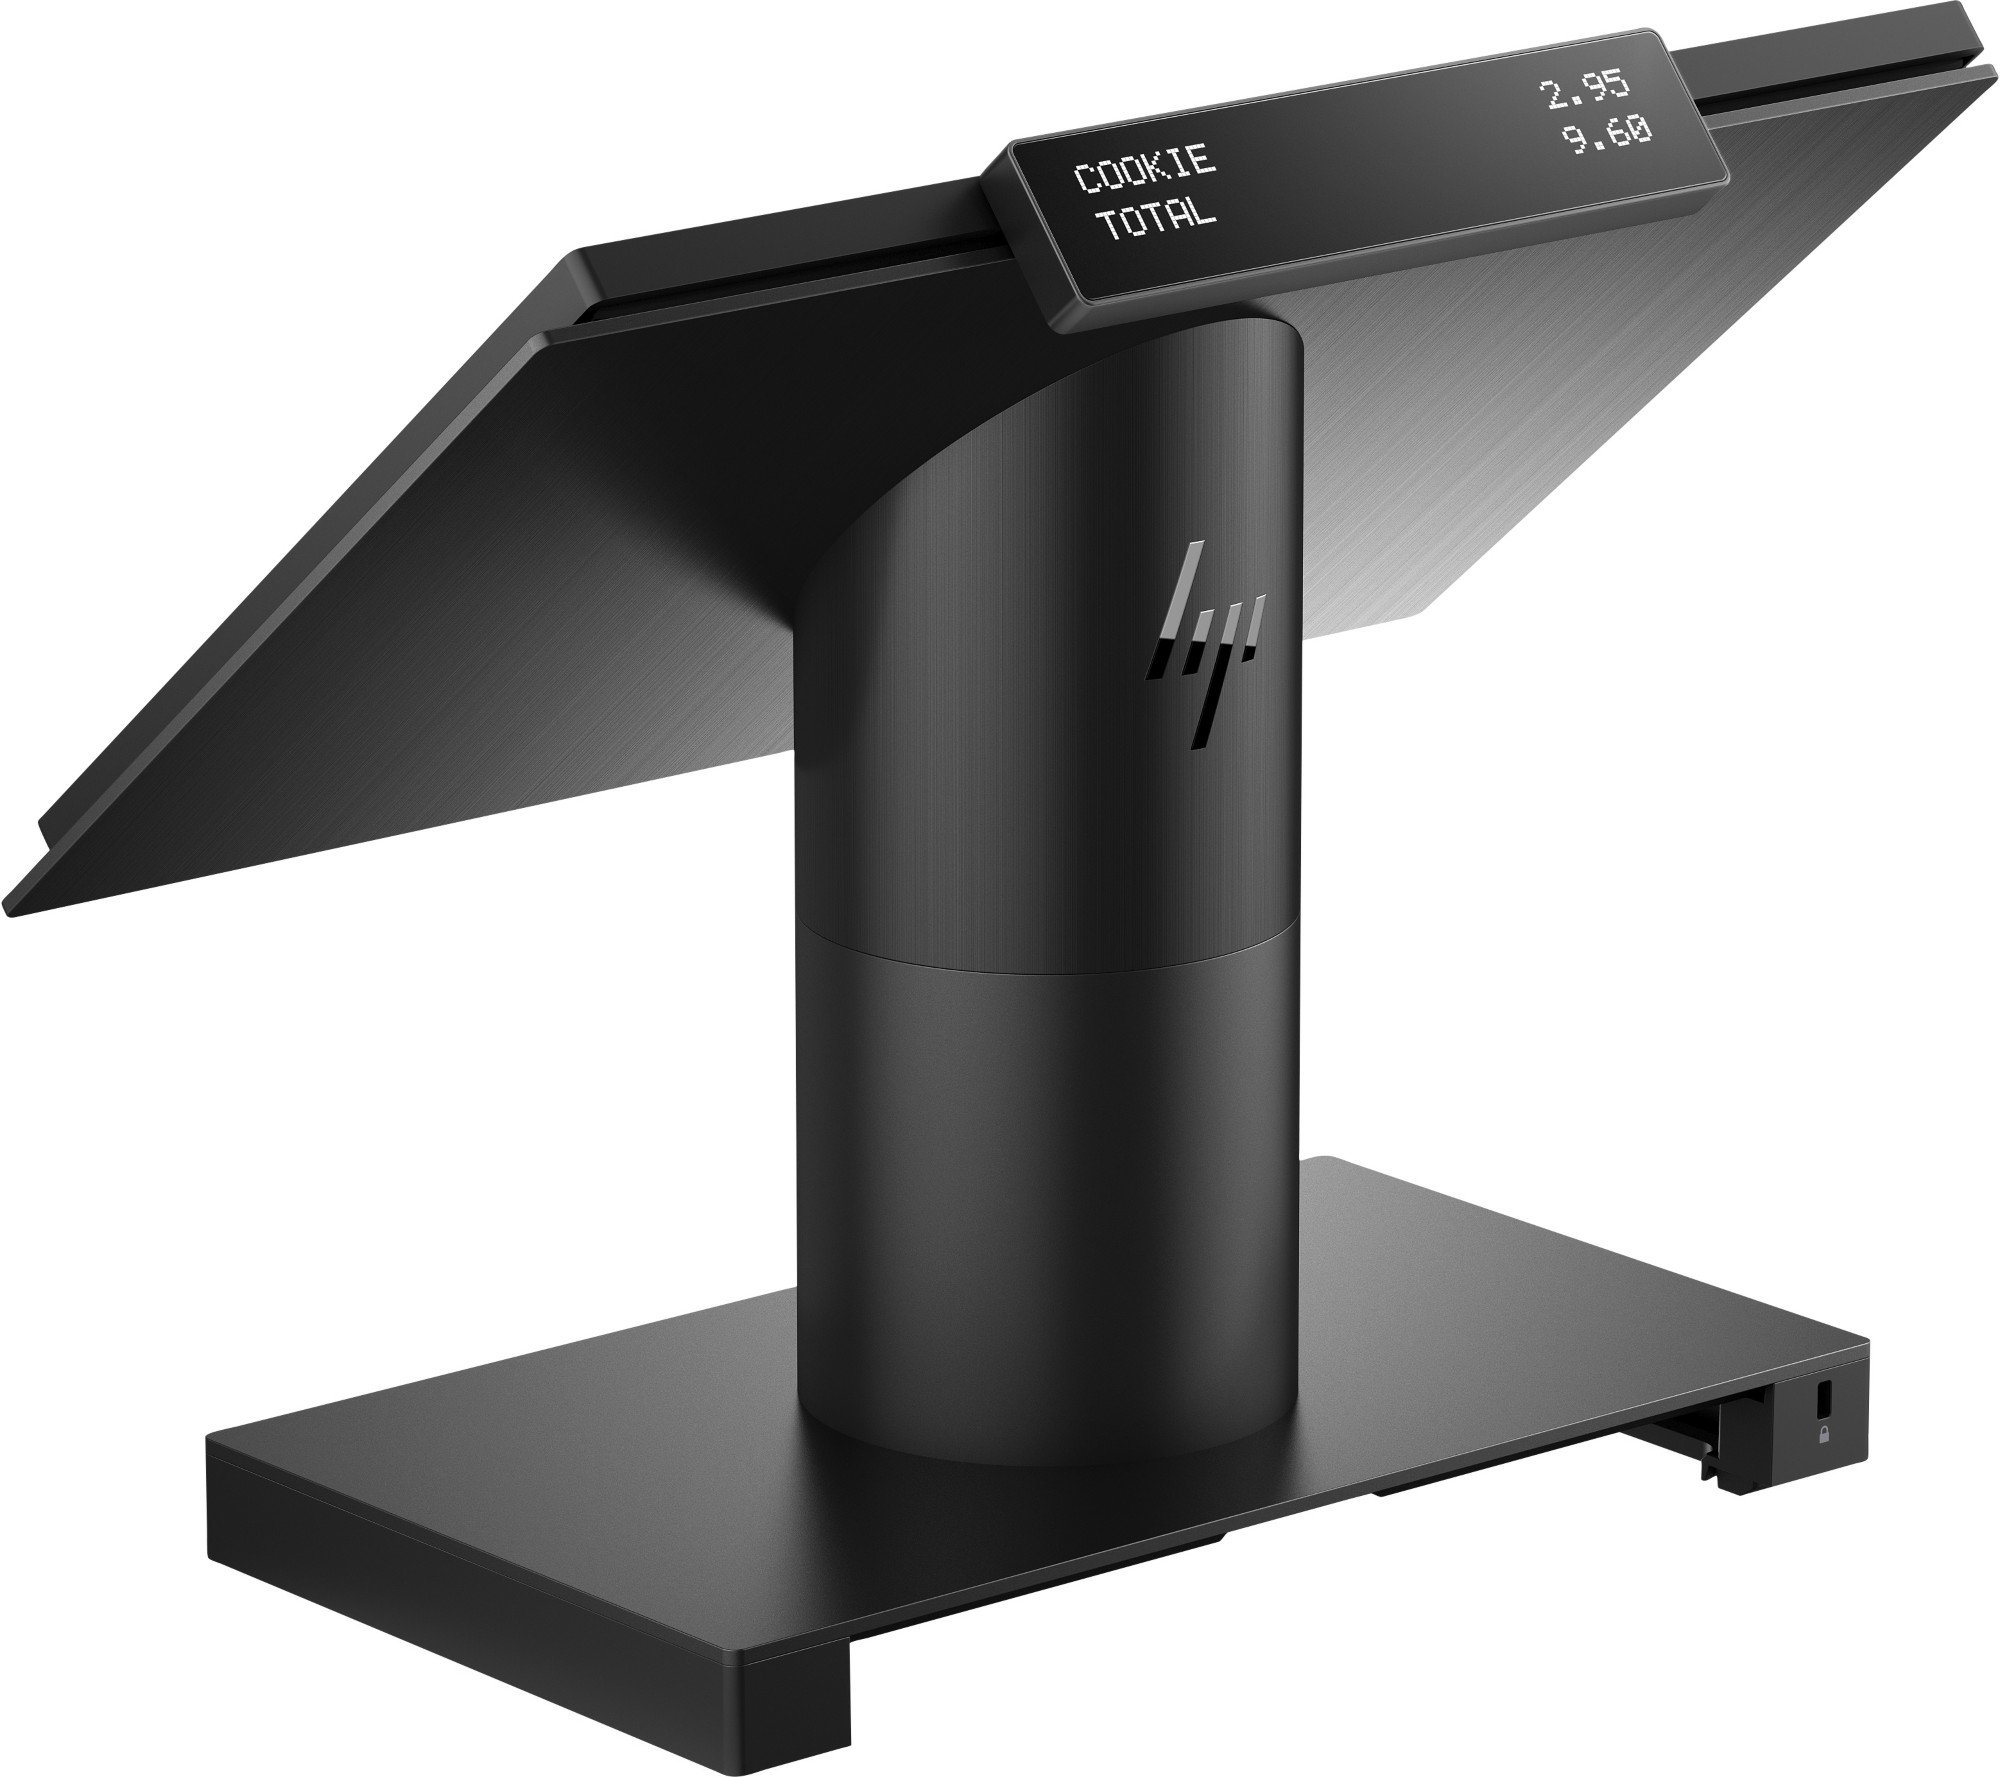 HP ElitePOS G1 Retail System Model 141